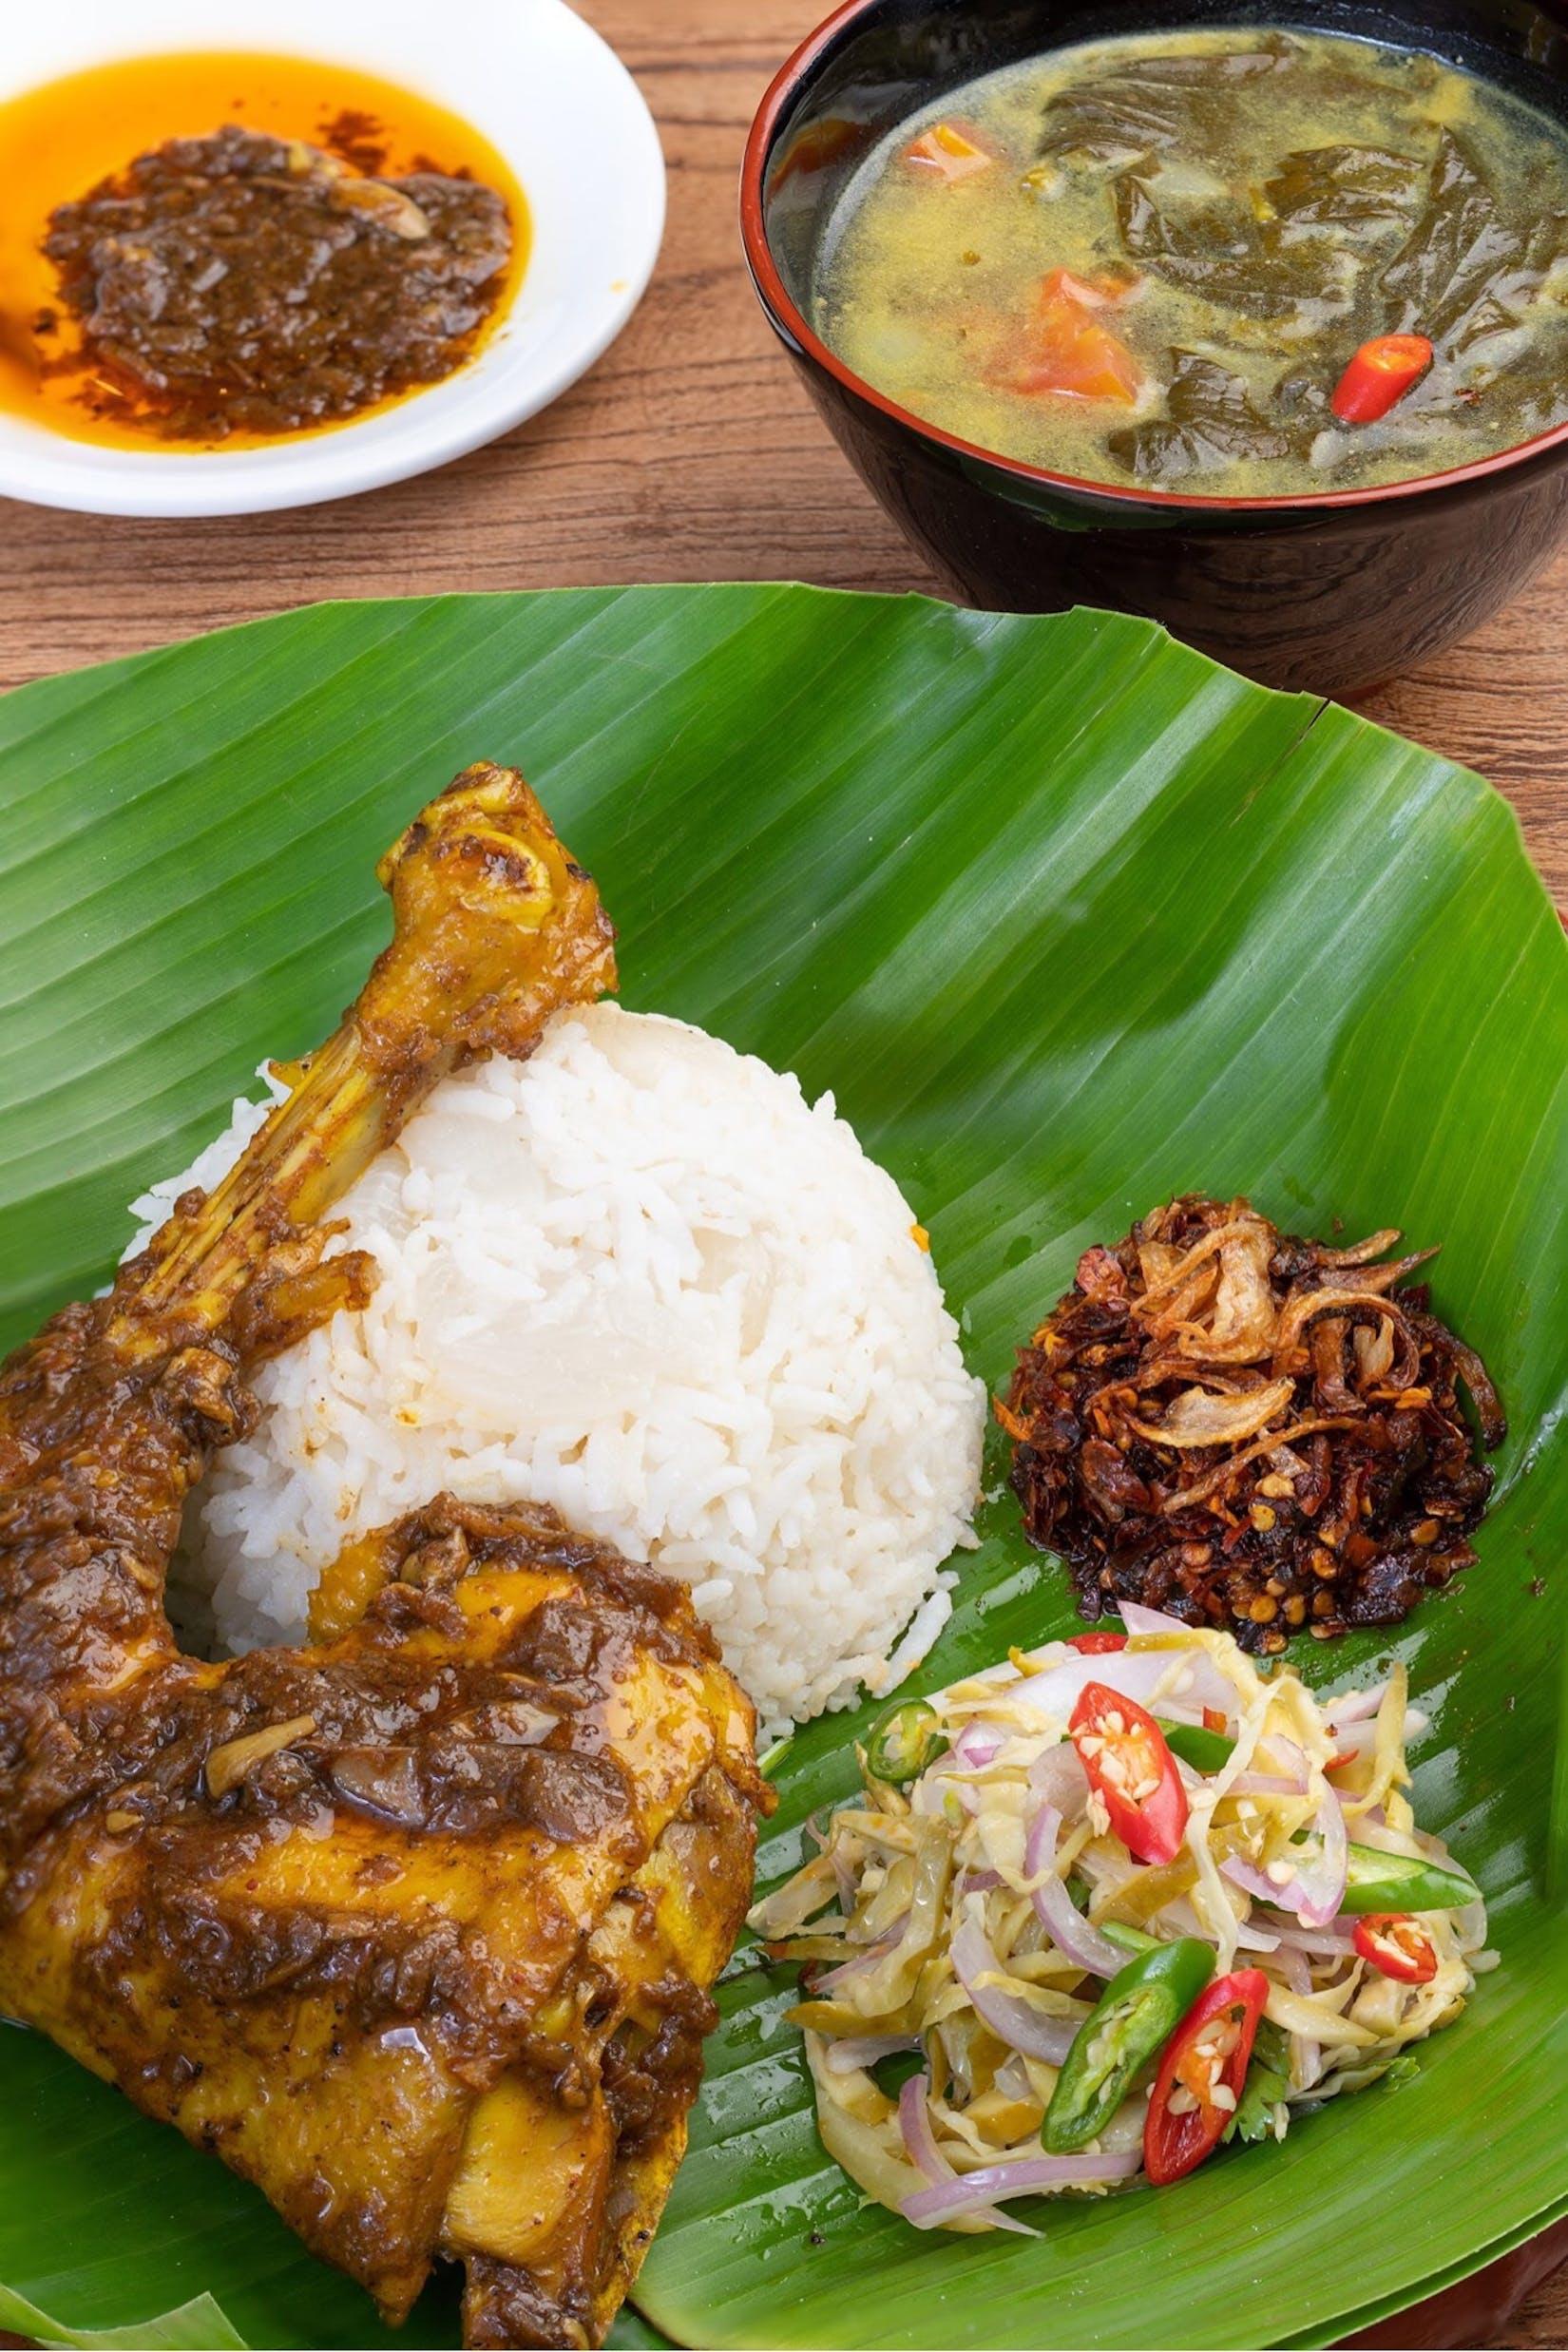 Taing Yin Thar Myanmar National Restaurant | yathar